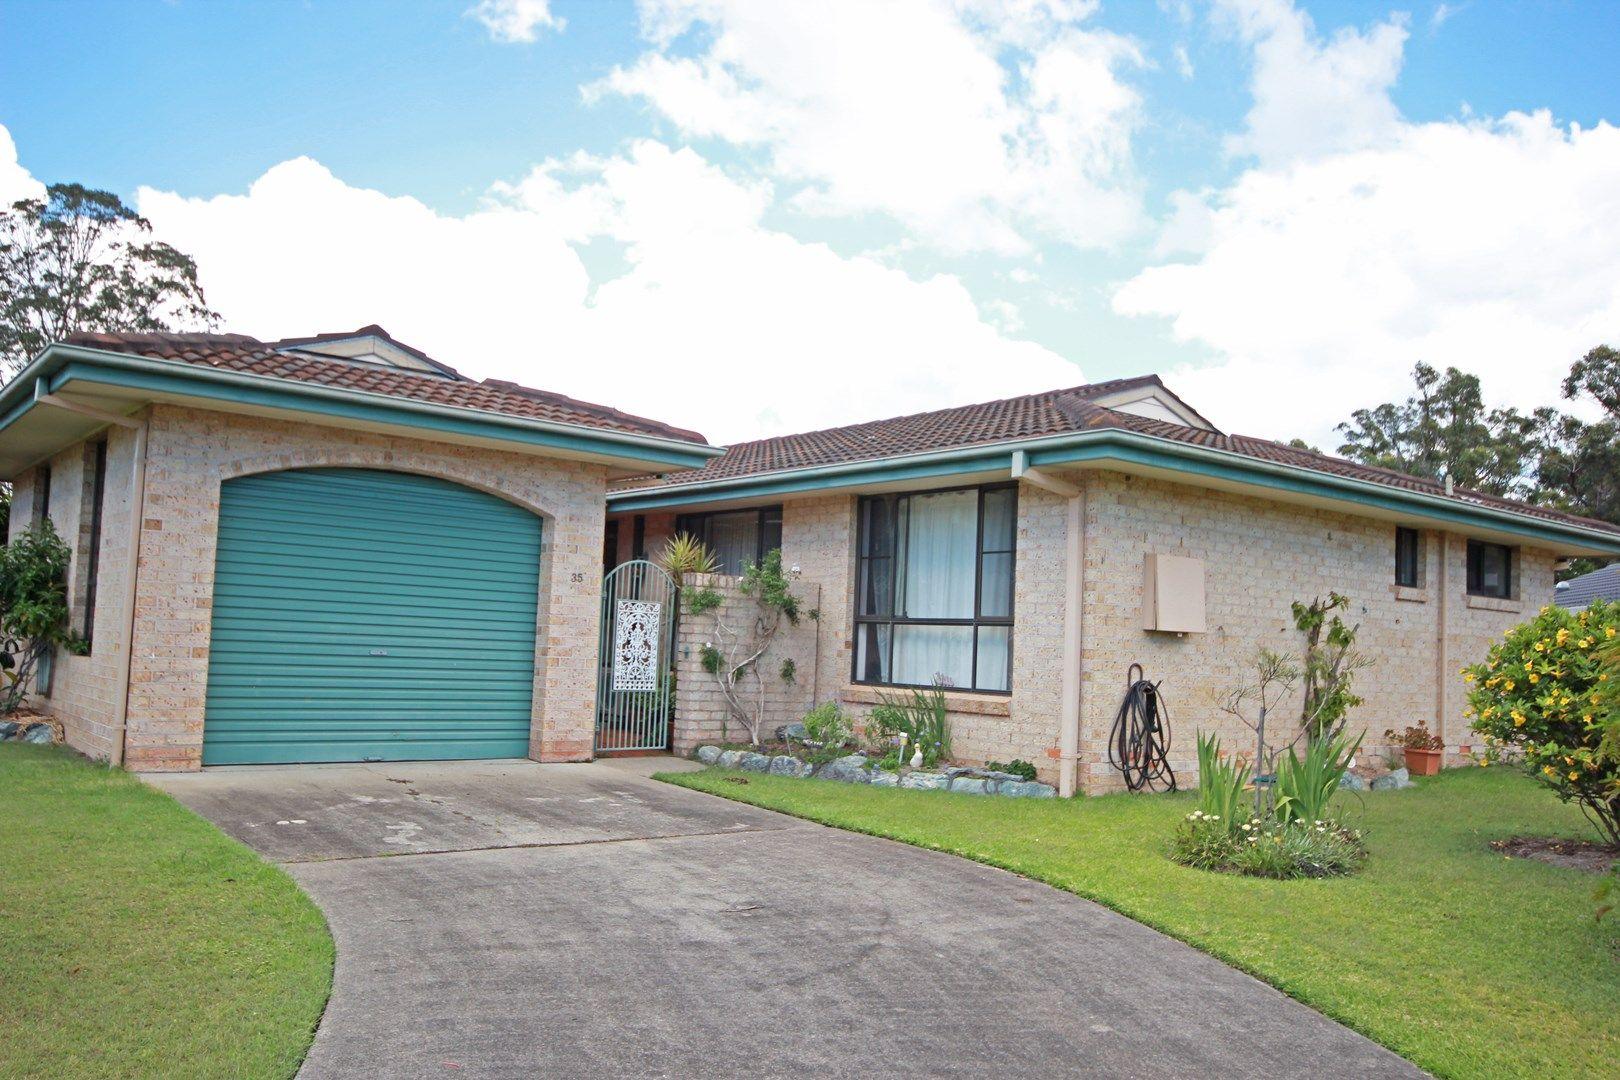 1/35 Honeysuckle Avenue, Lakewood NSW 2443, Image 0